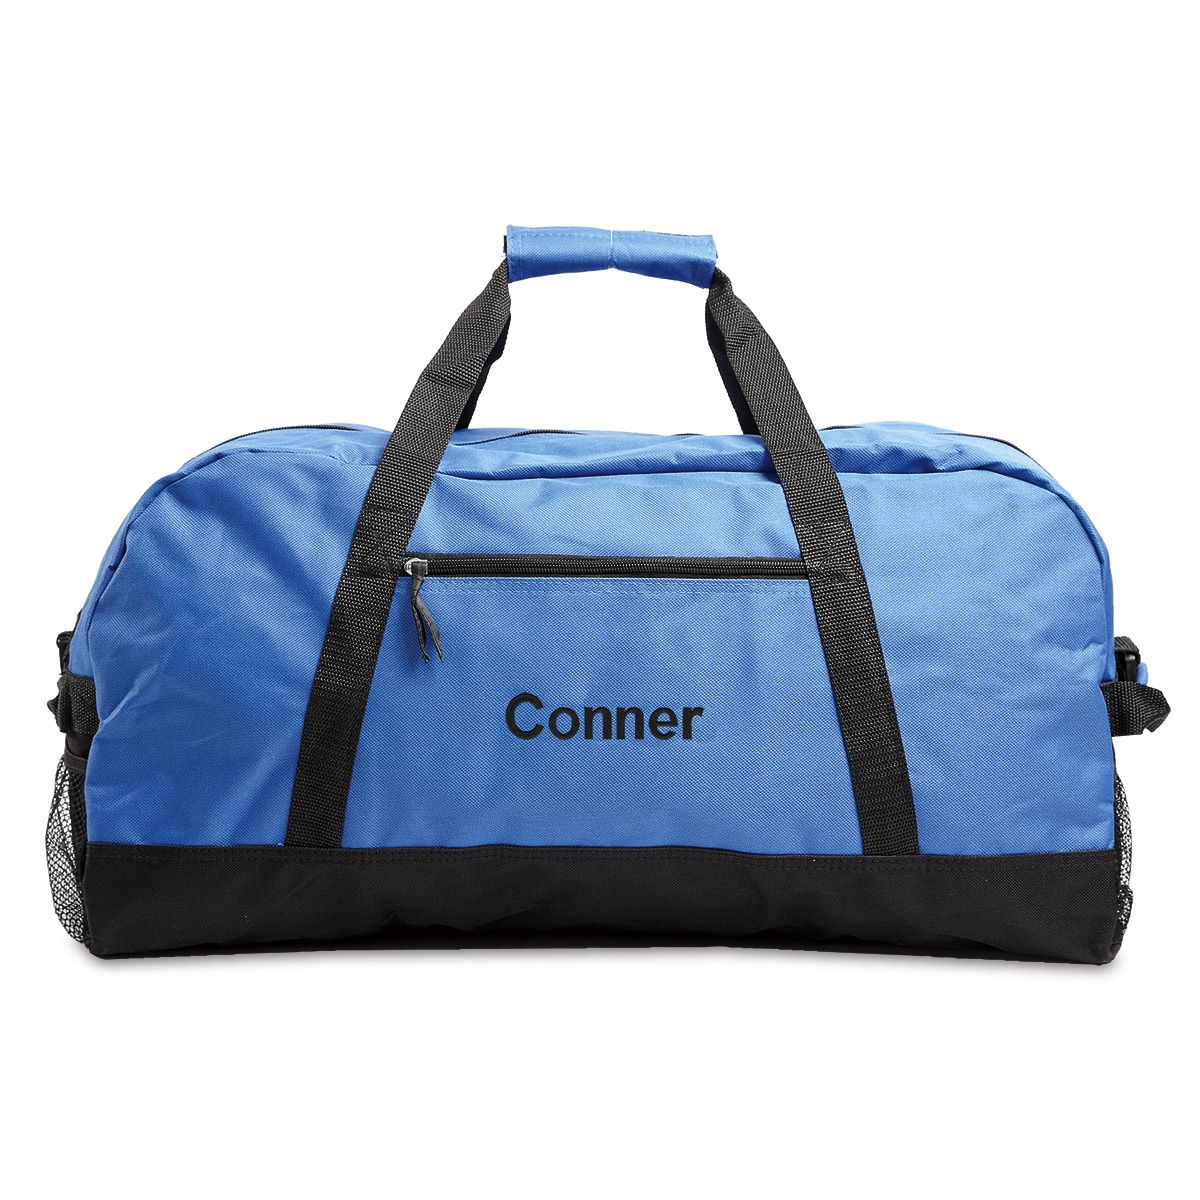 "Blue and Black 19"" Duffel Bag"